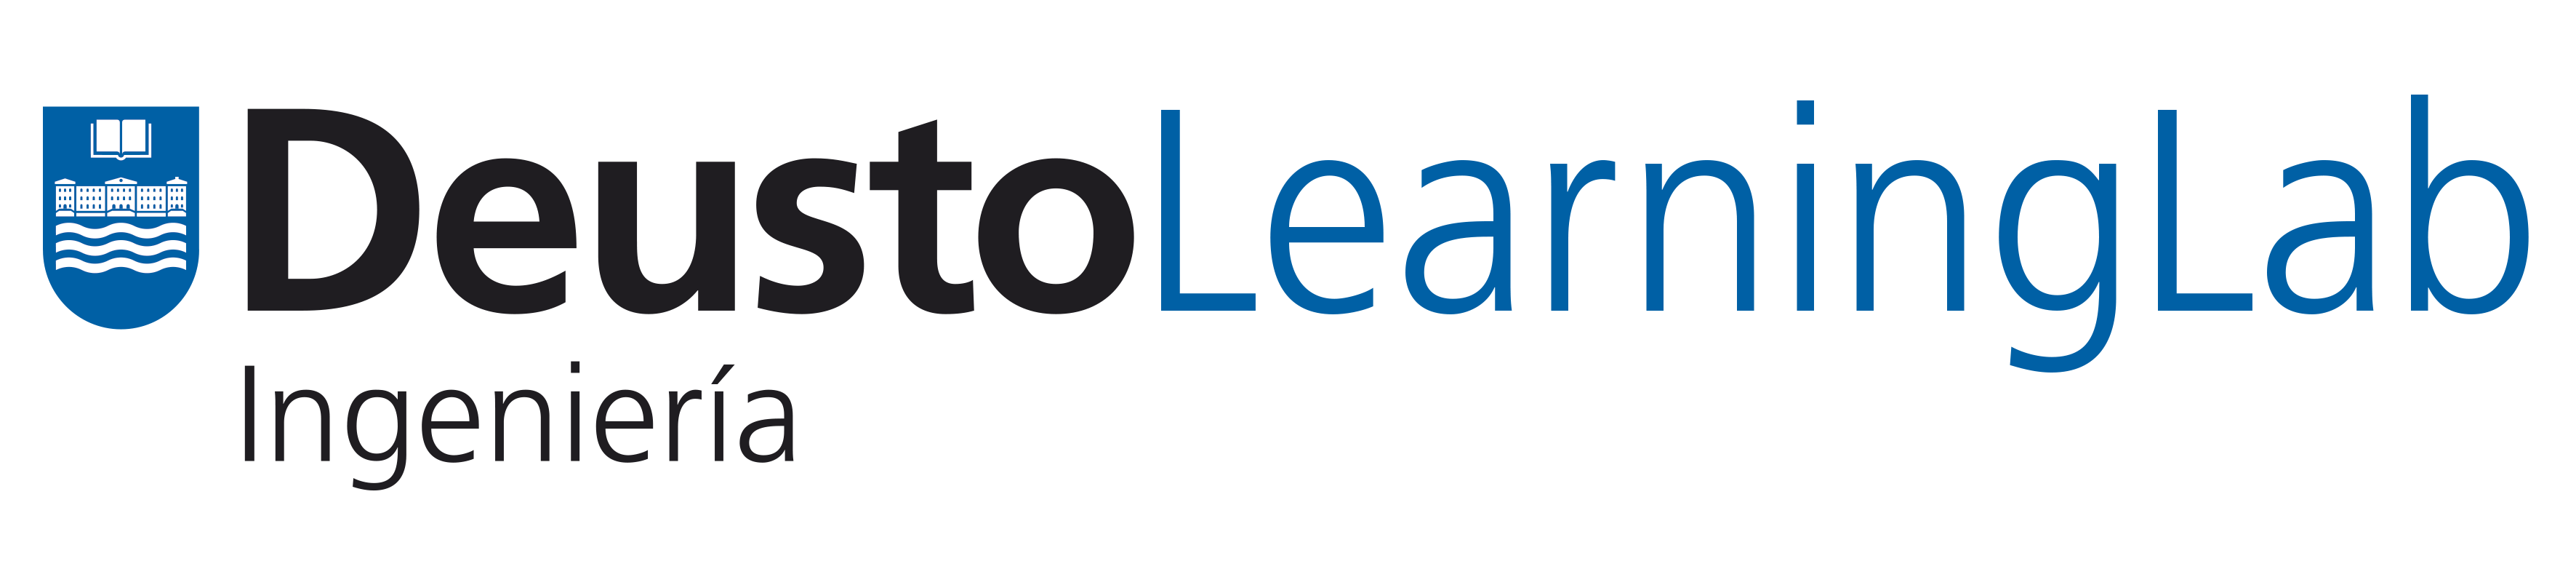 LearningLab logo